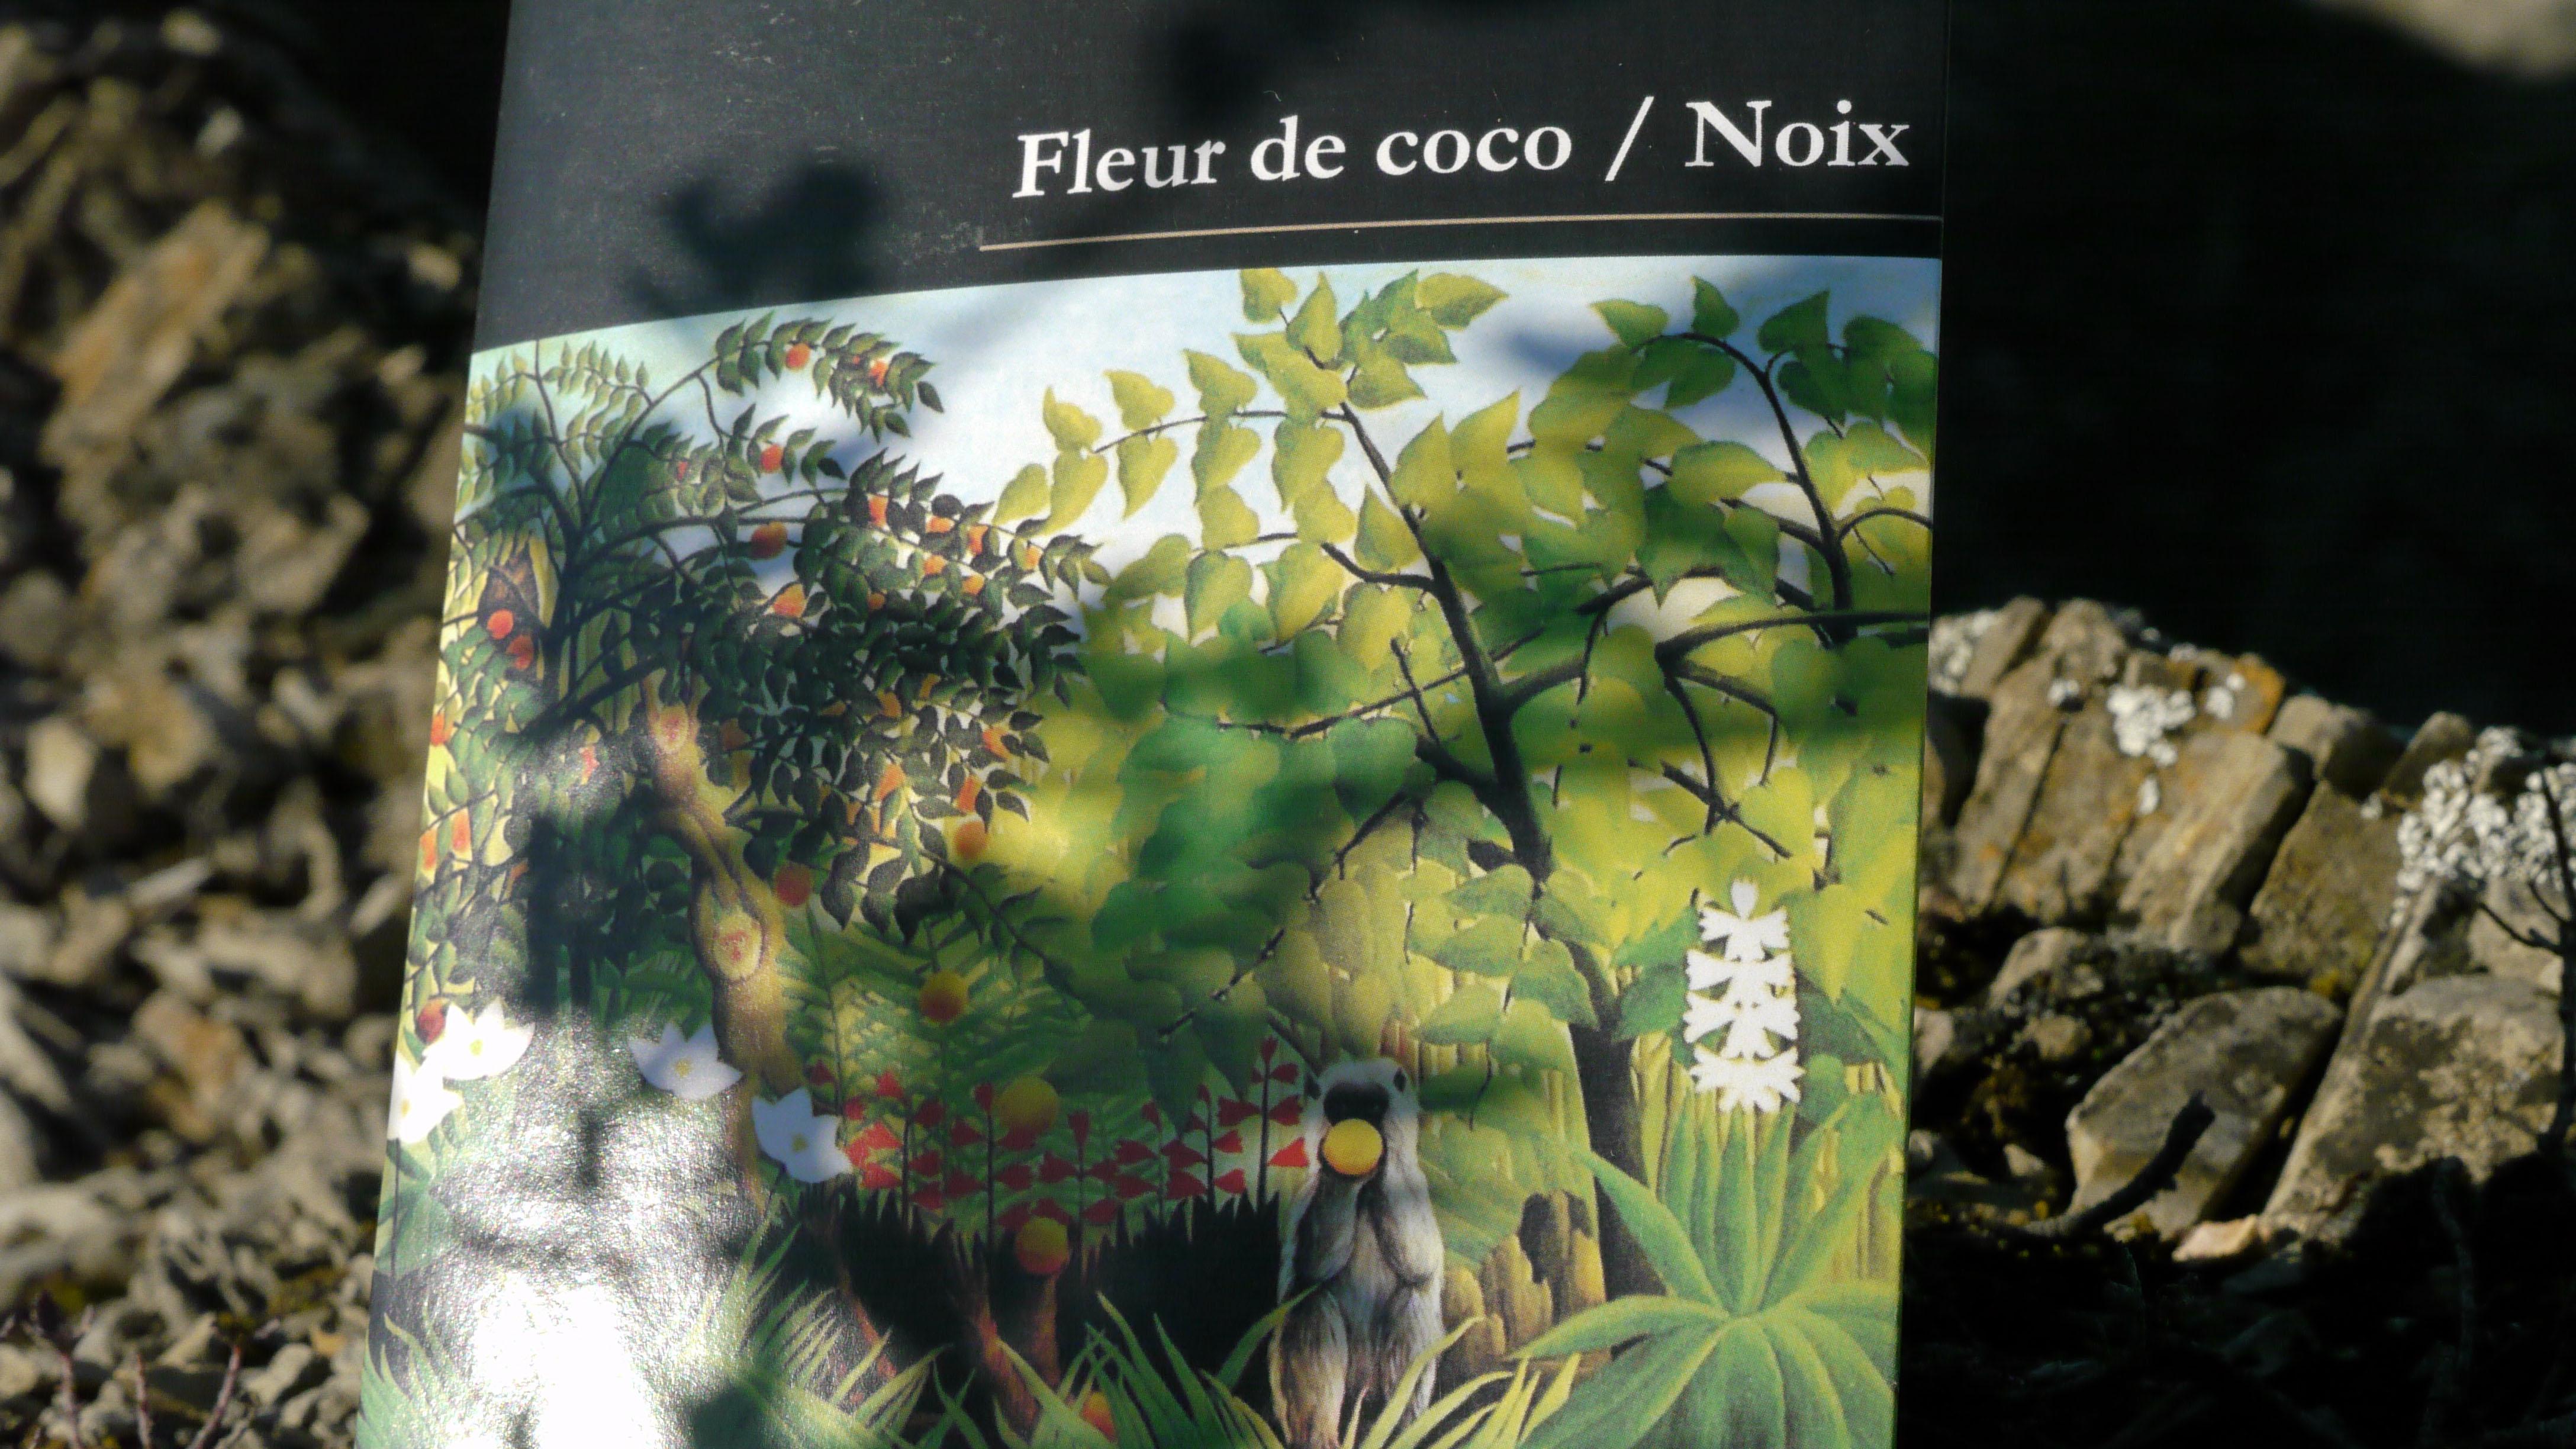 Rohschokolade 'Cru sauvage' Kokosnuss-Blume Walnüsse 2